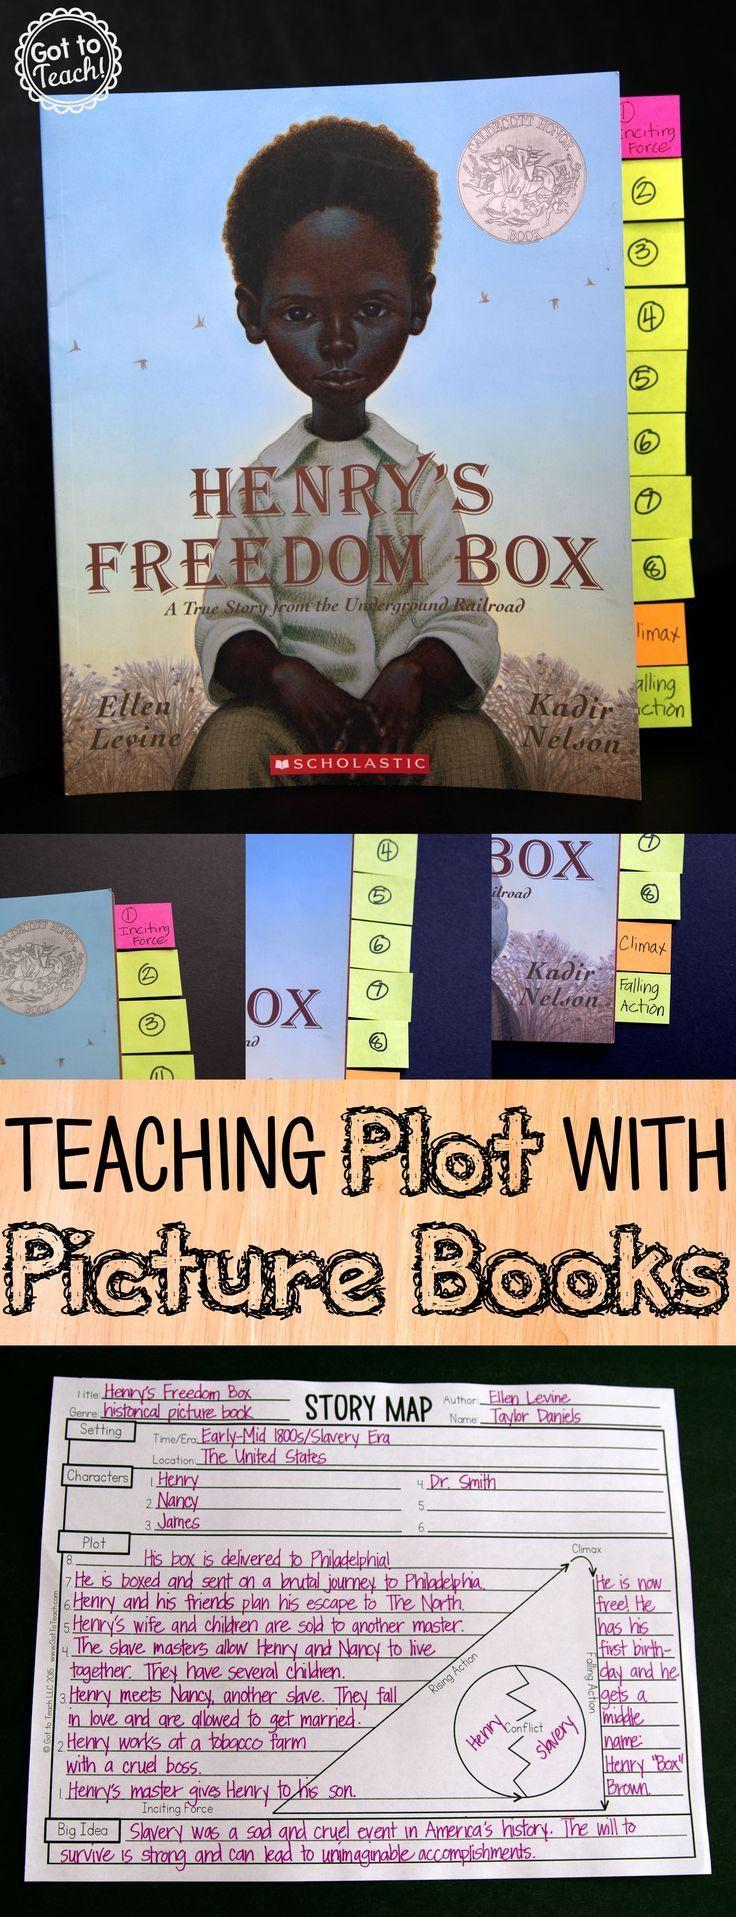 Grade 6 Literature Units - Book reports, vocabulary, quizzes